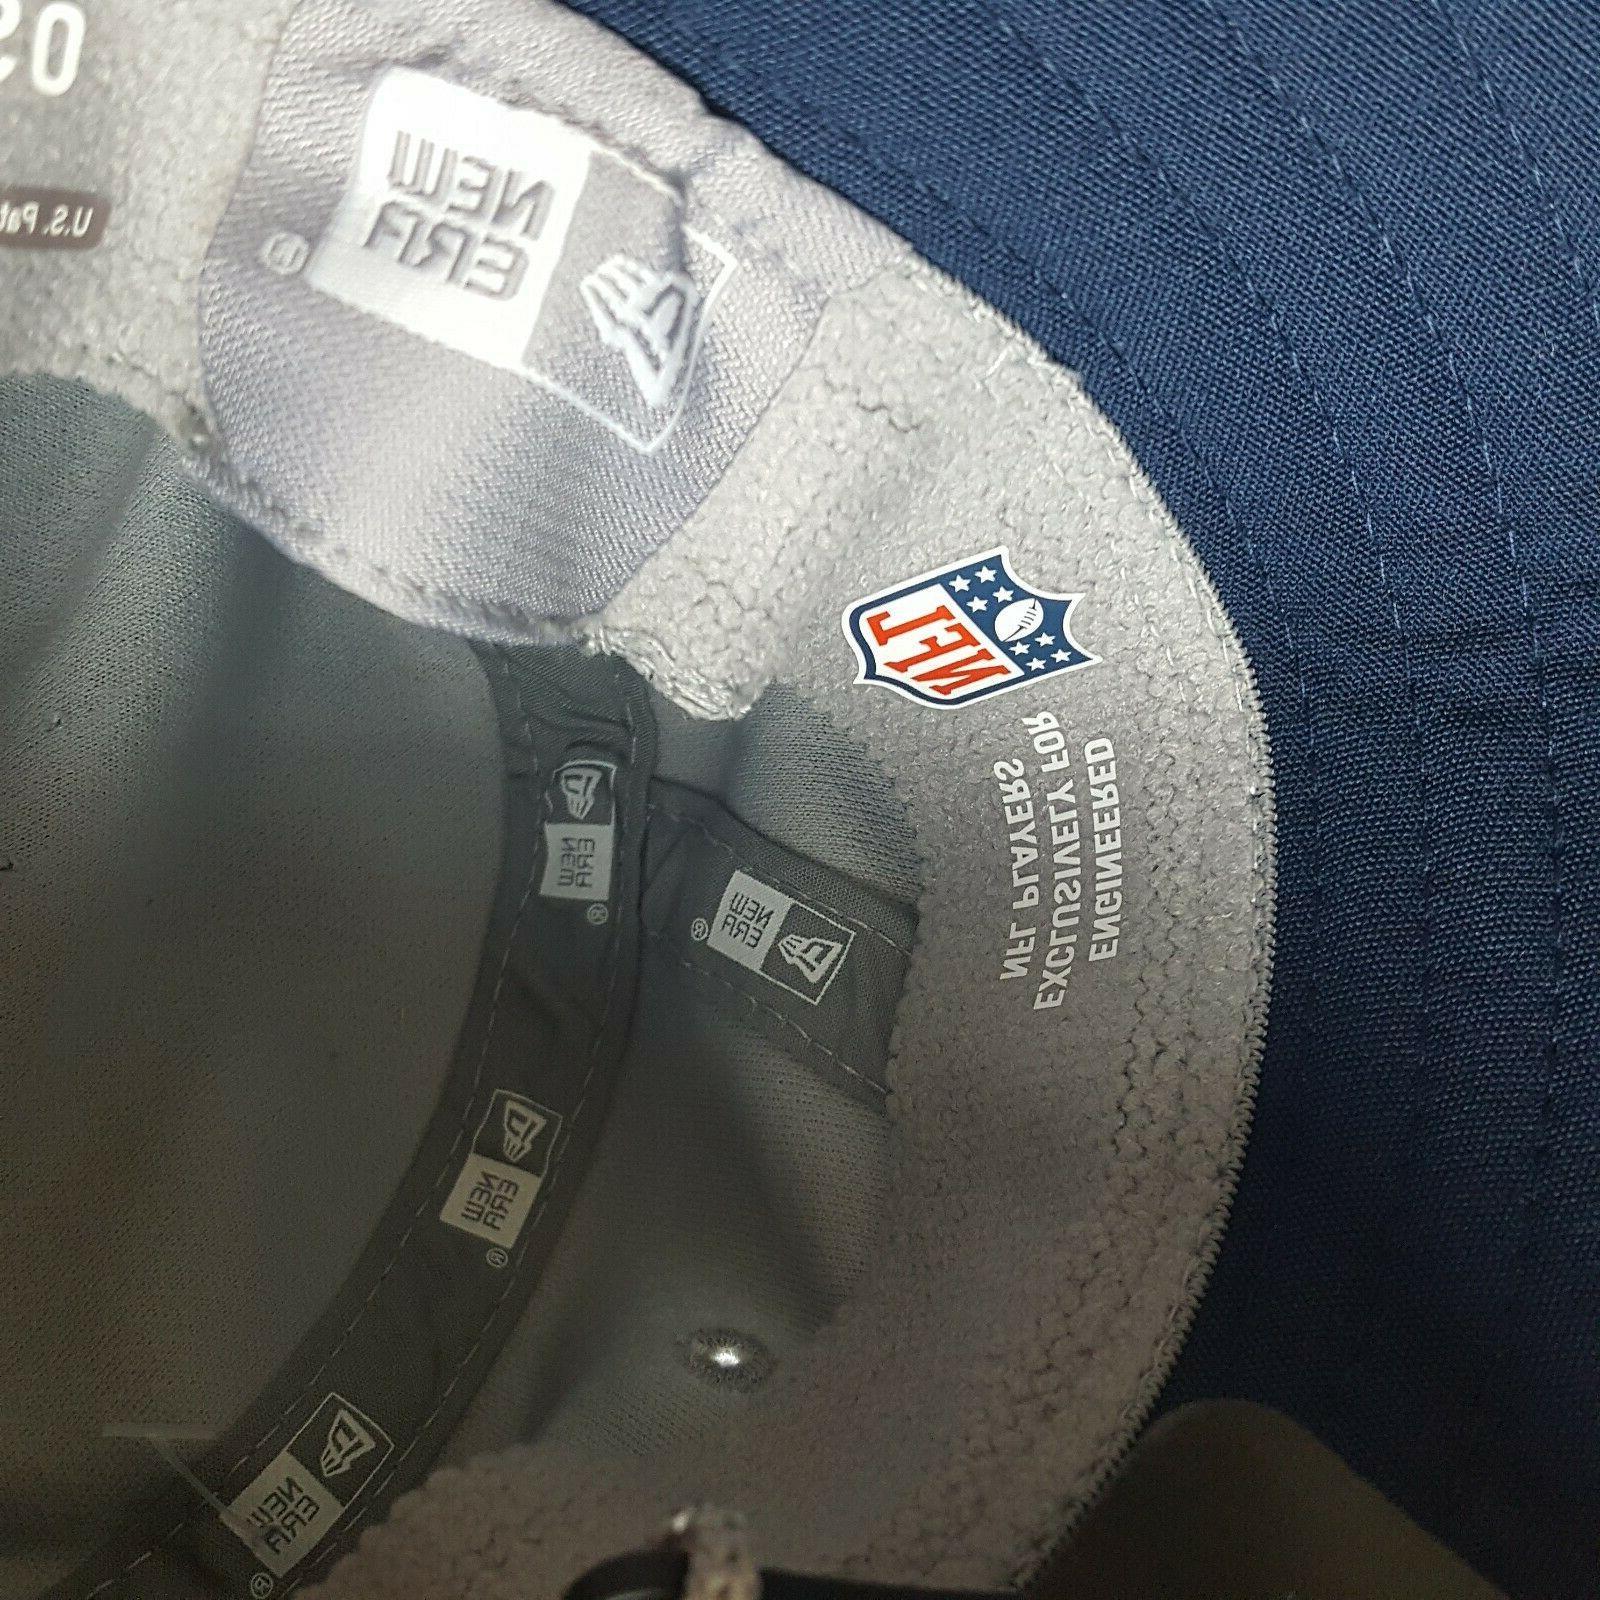 New Dallas 2018 On Training Hat Gray OSFM